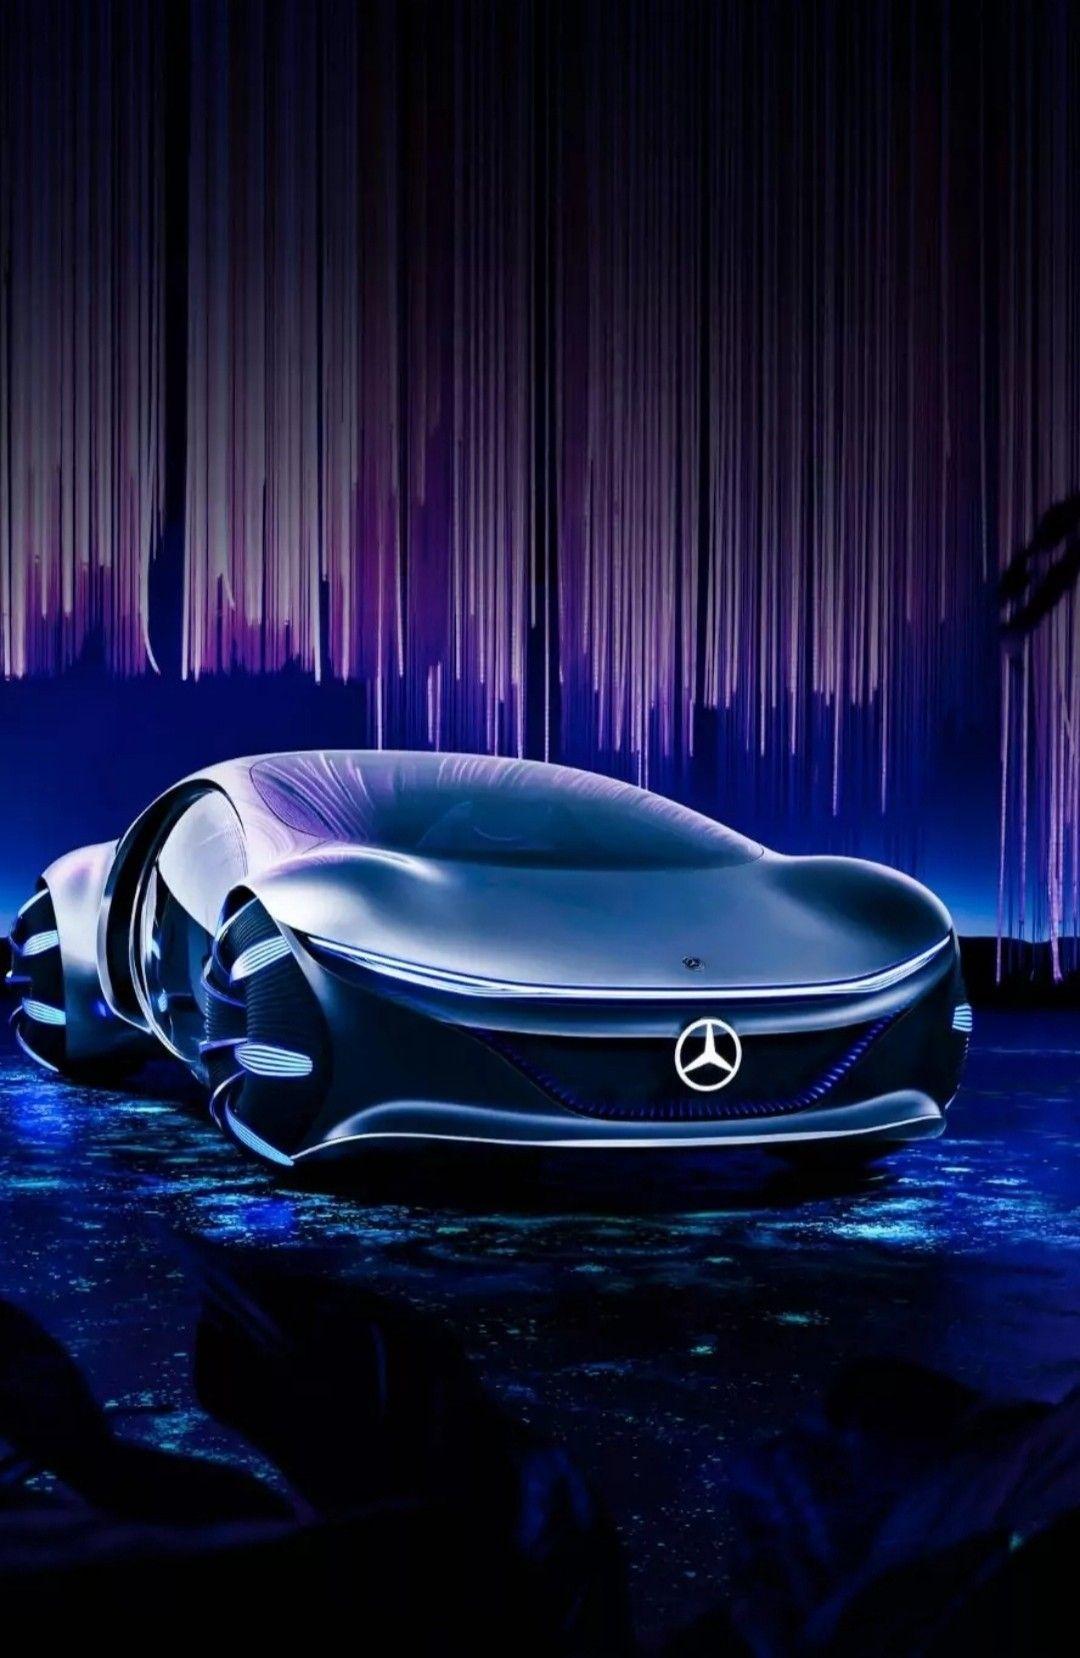 Mercedes 2050 Model 3d Modeling Hybrid Car In 2020 Cars Movie Hybrid Car Concept Cars